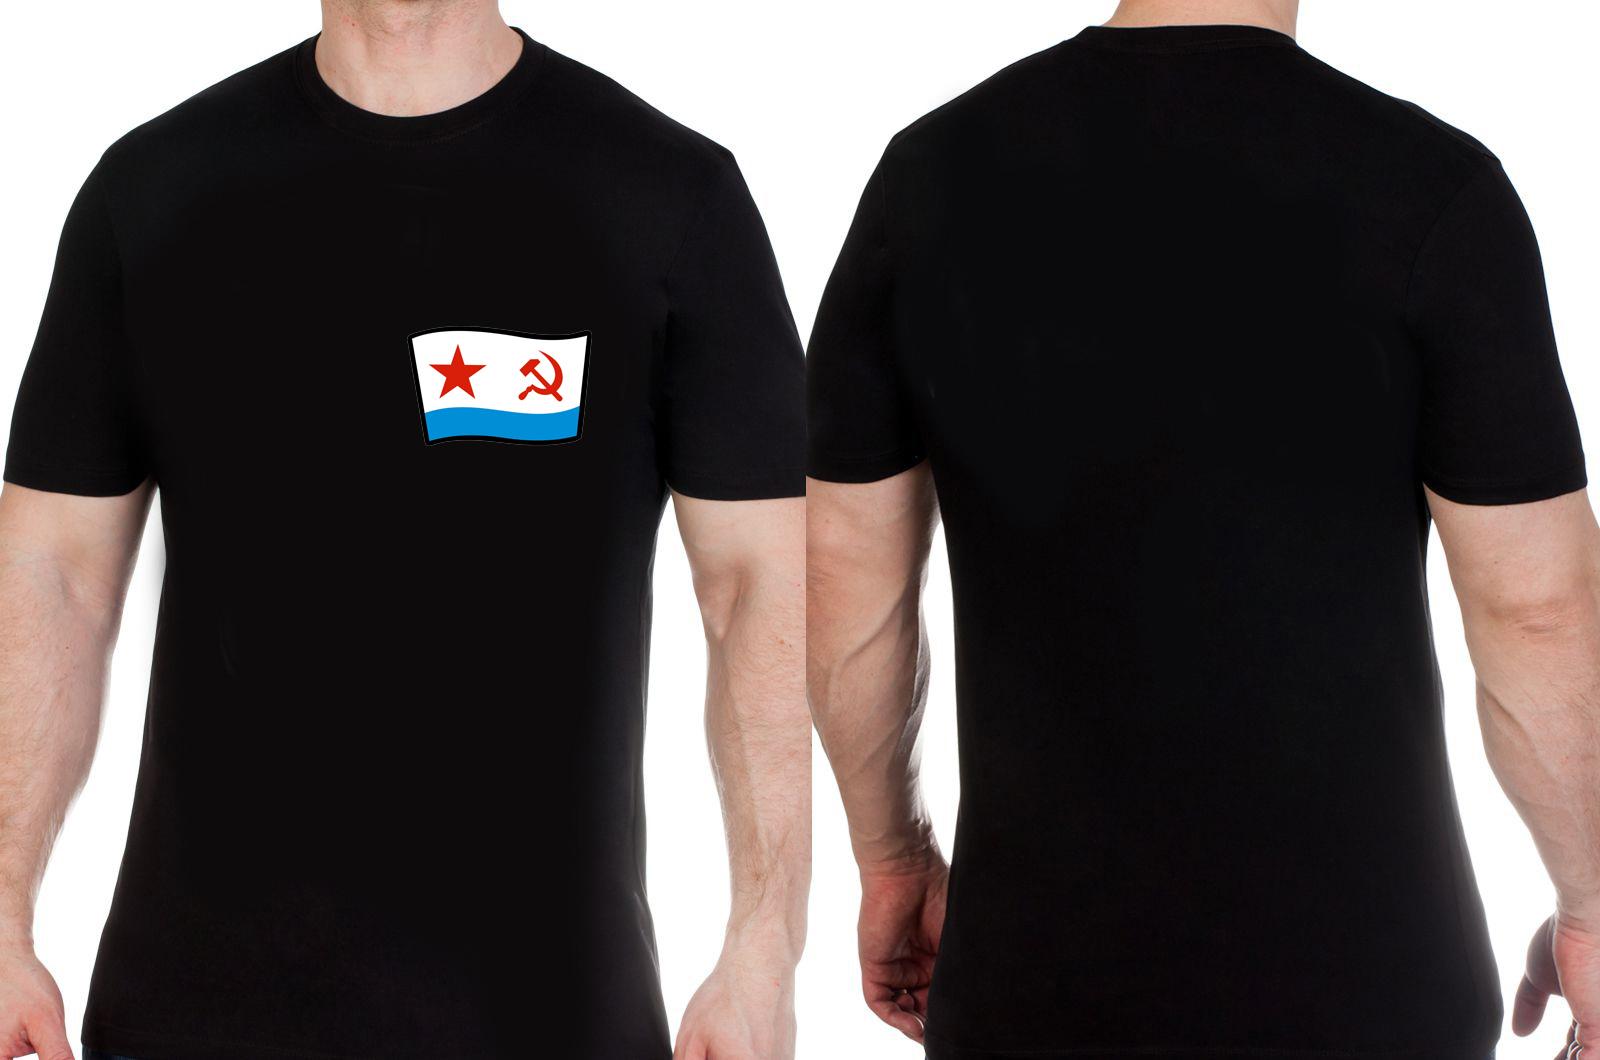 Черная футболка ВМФ СССР с доставкой